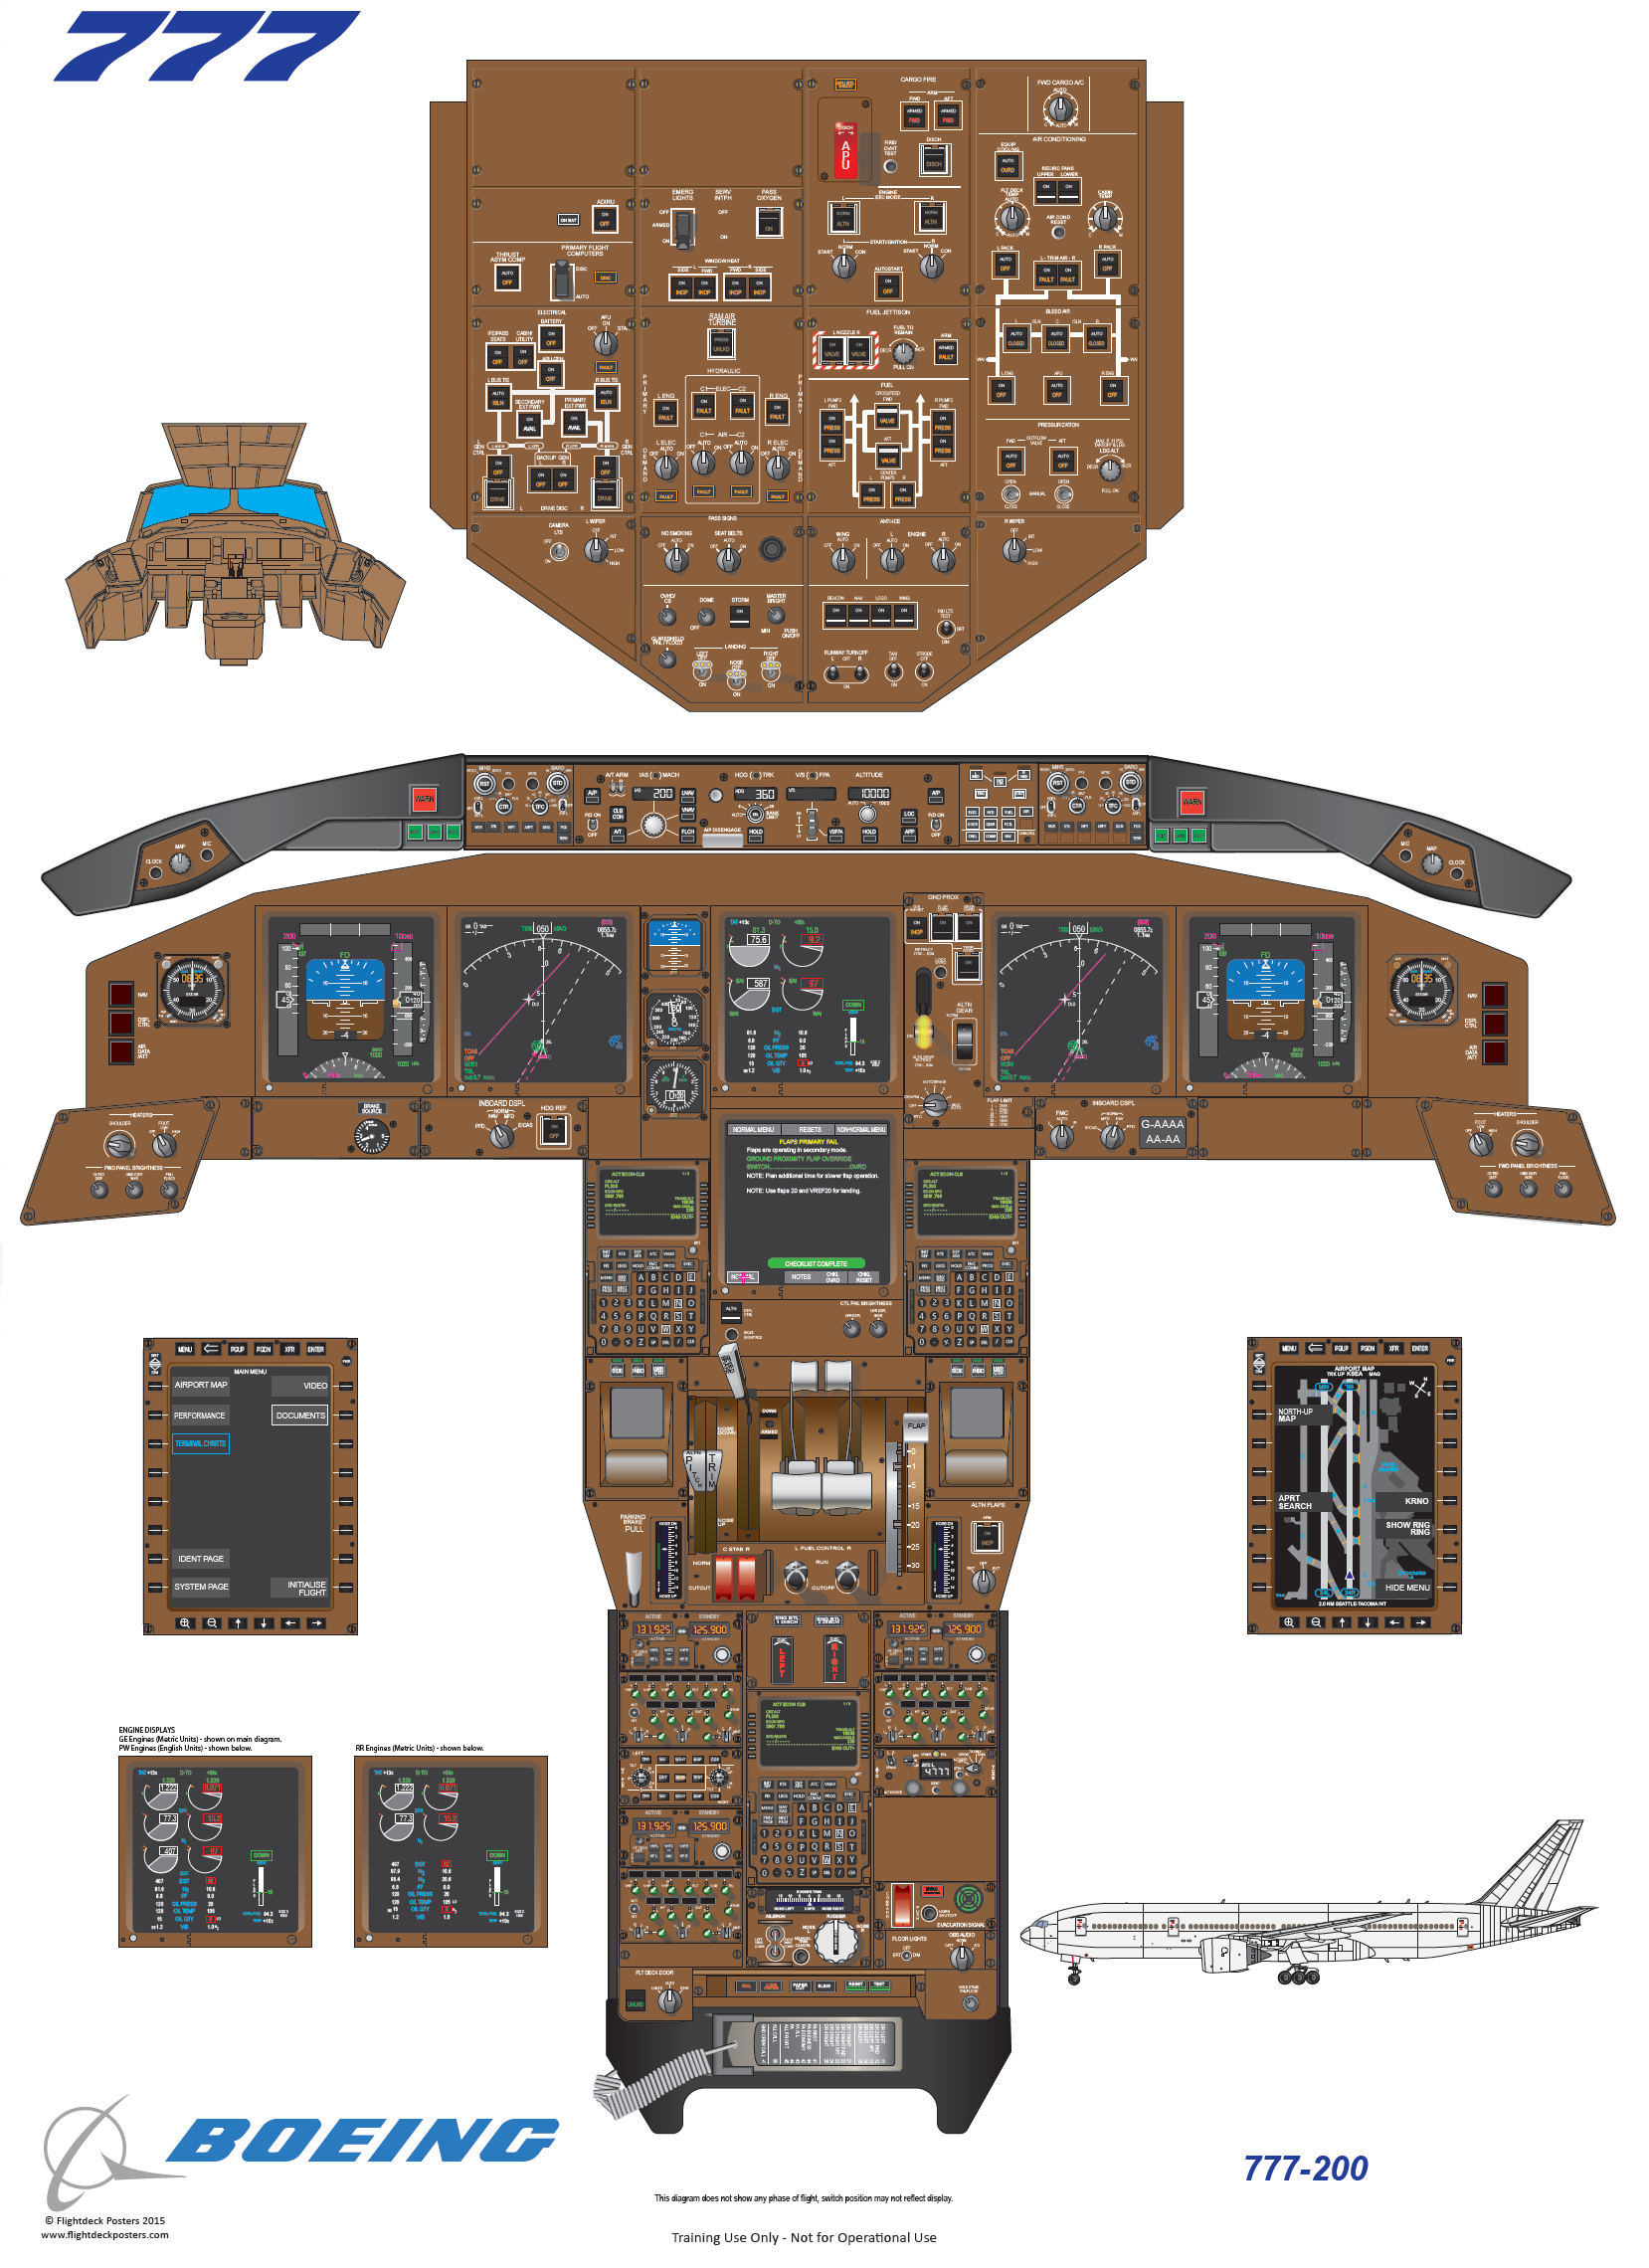 medium resolution of boeing 777 cockpit diagram used for training pilots